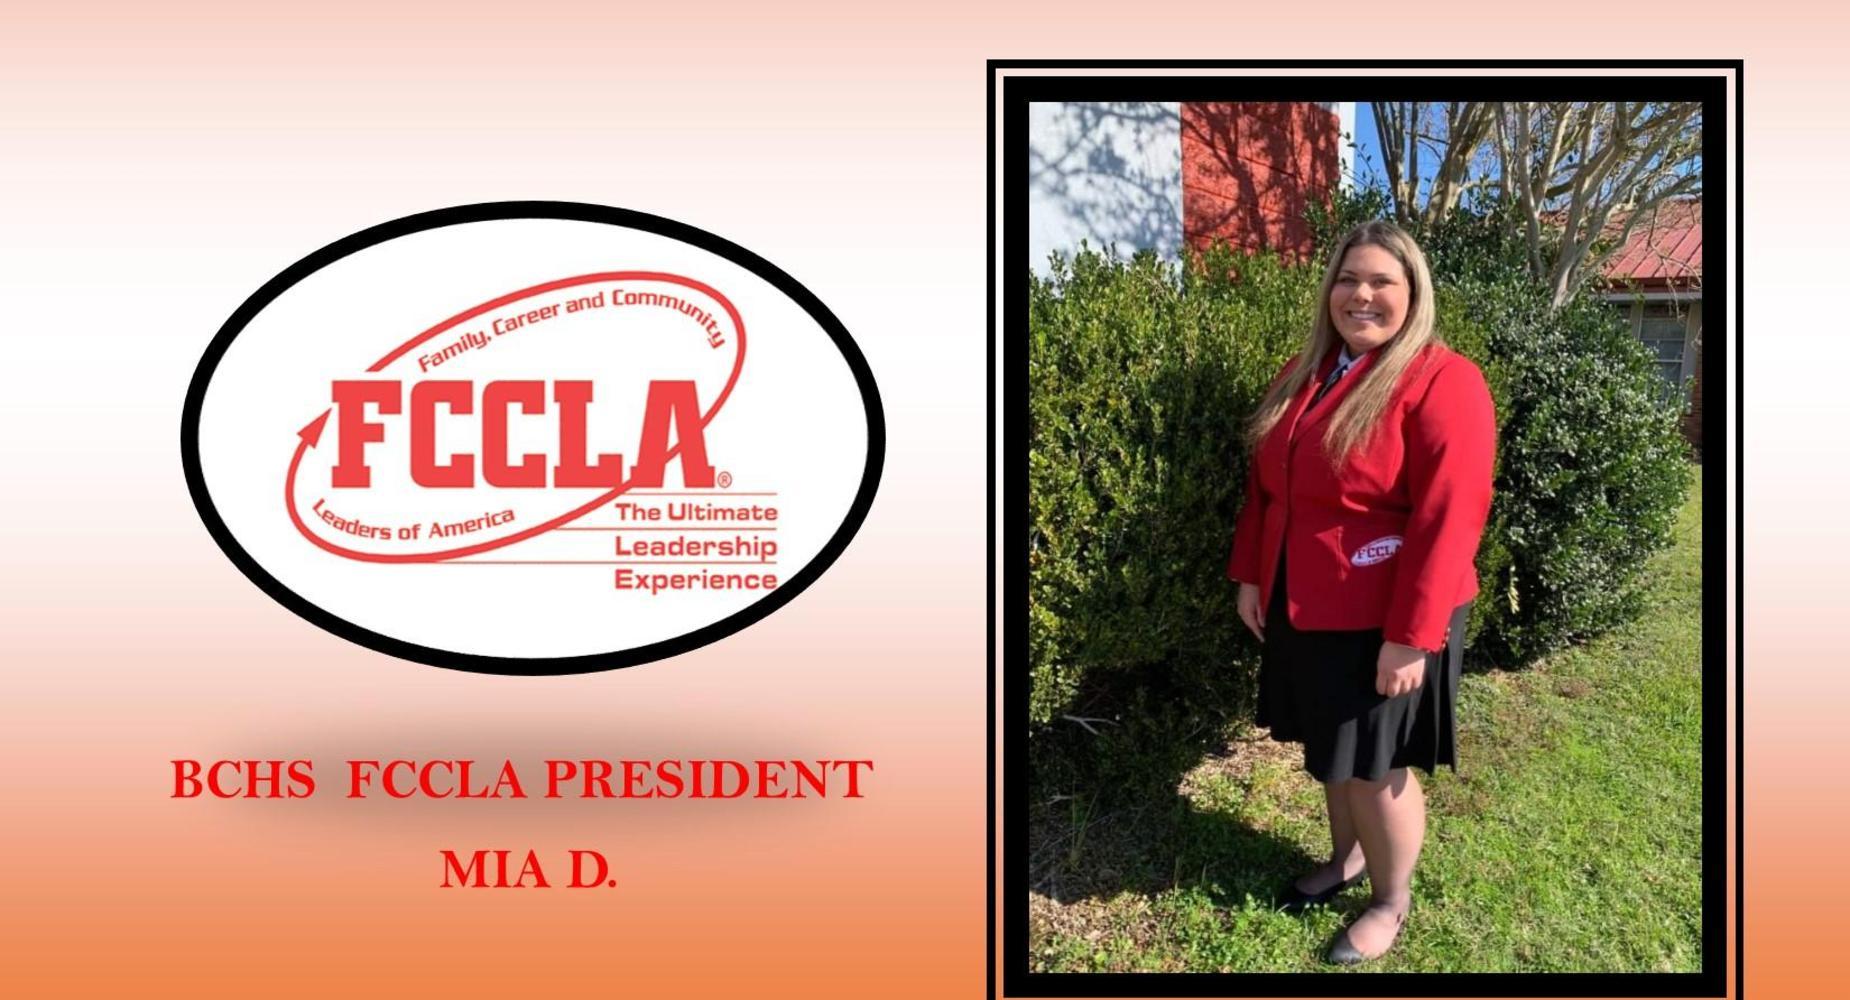 FCCLA President - Mia Davis